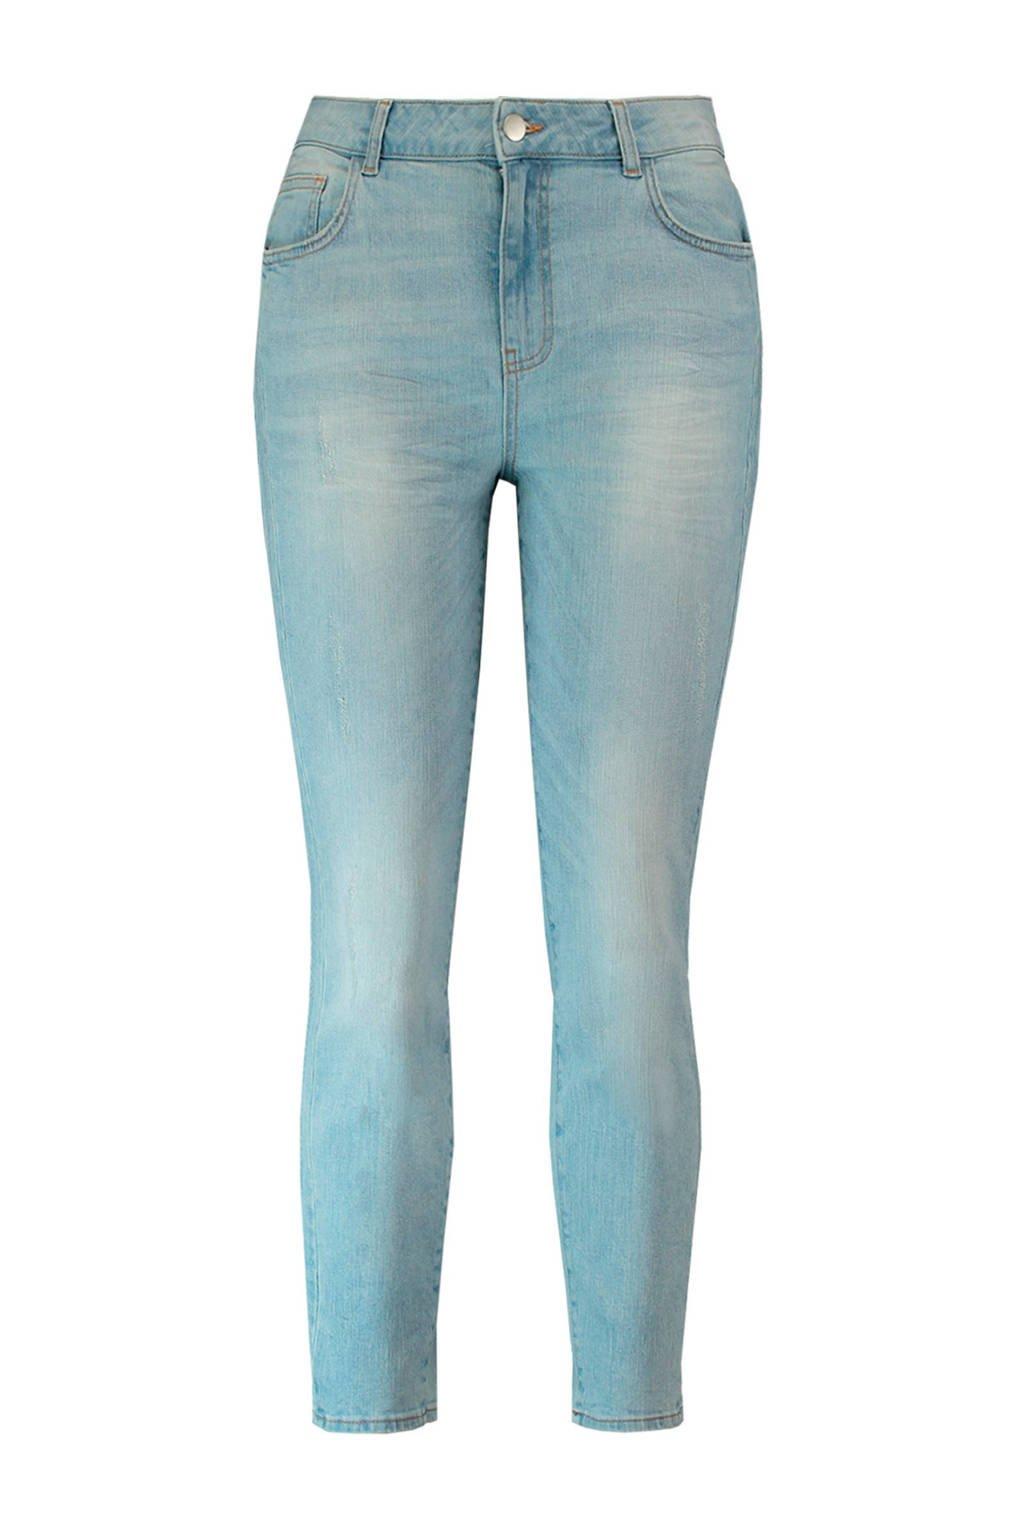 MS Mode slim fit jeans met slijtage details, Bleached denim